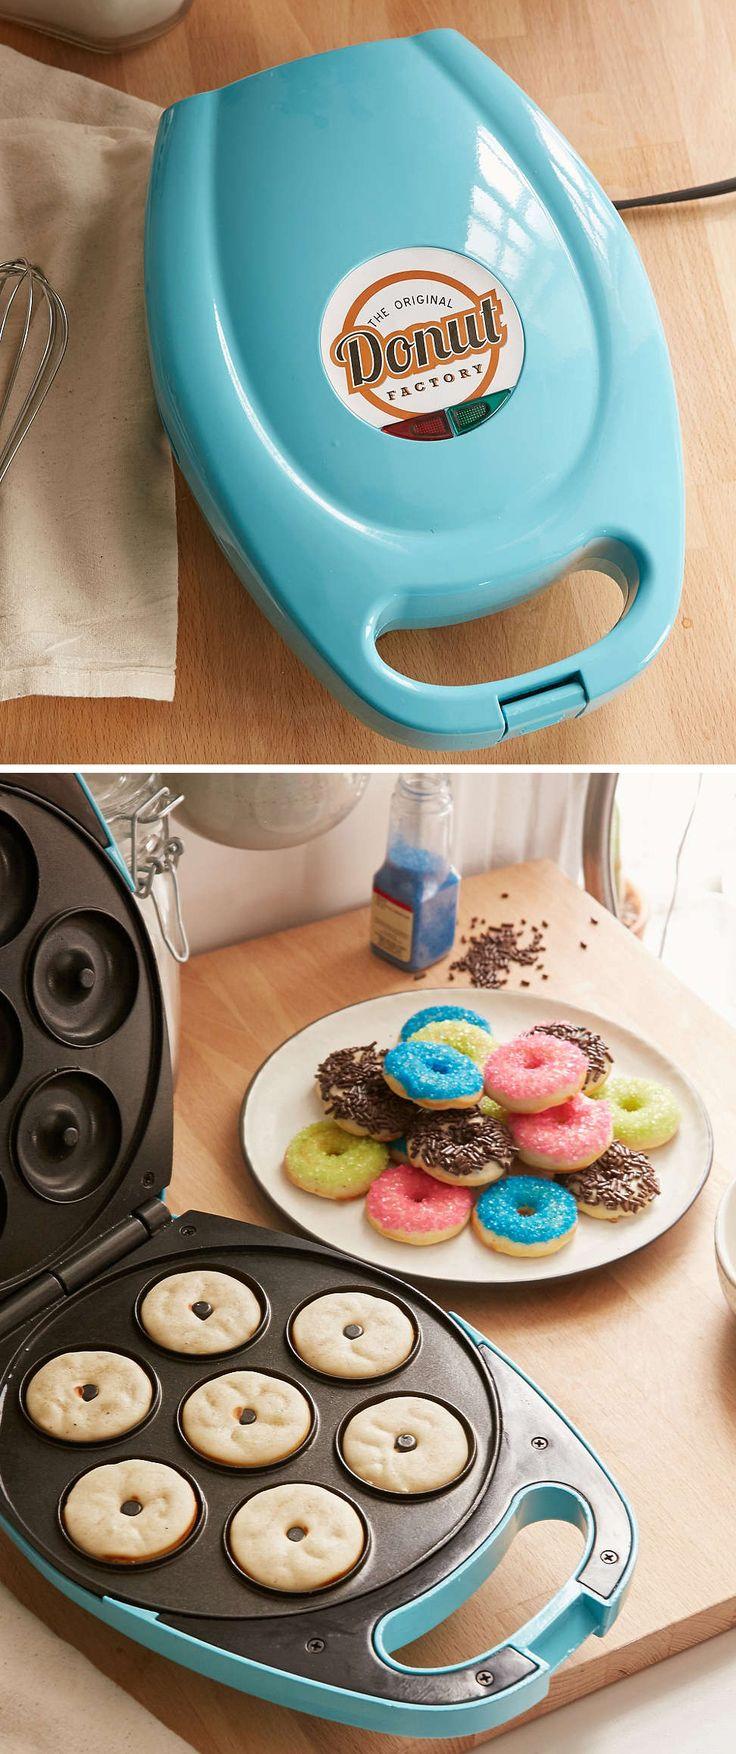 Teal Mini Donut Maker